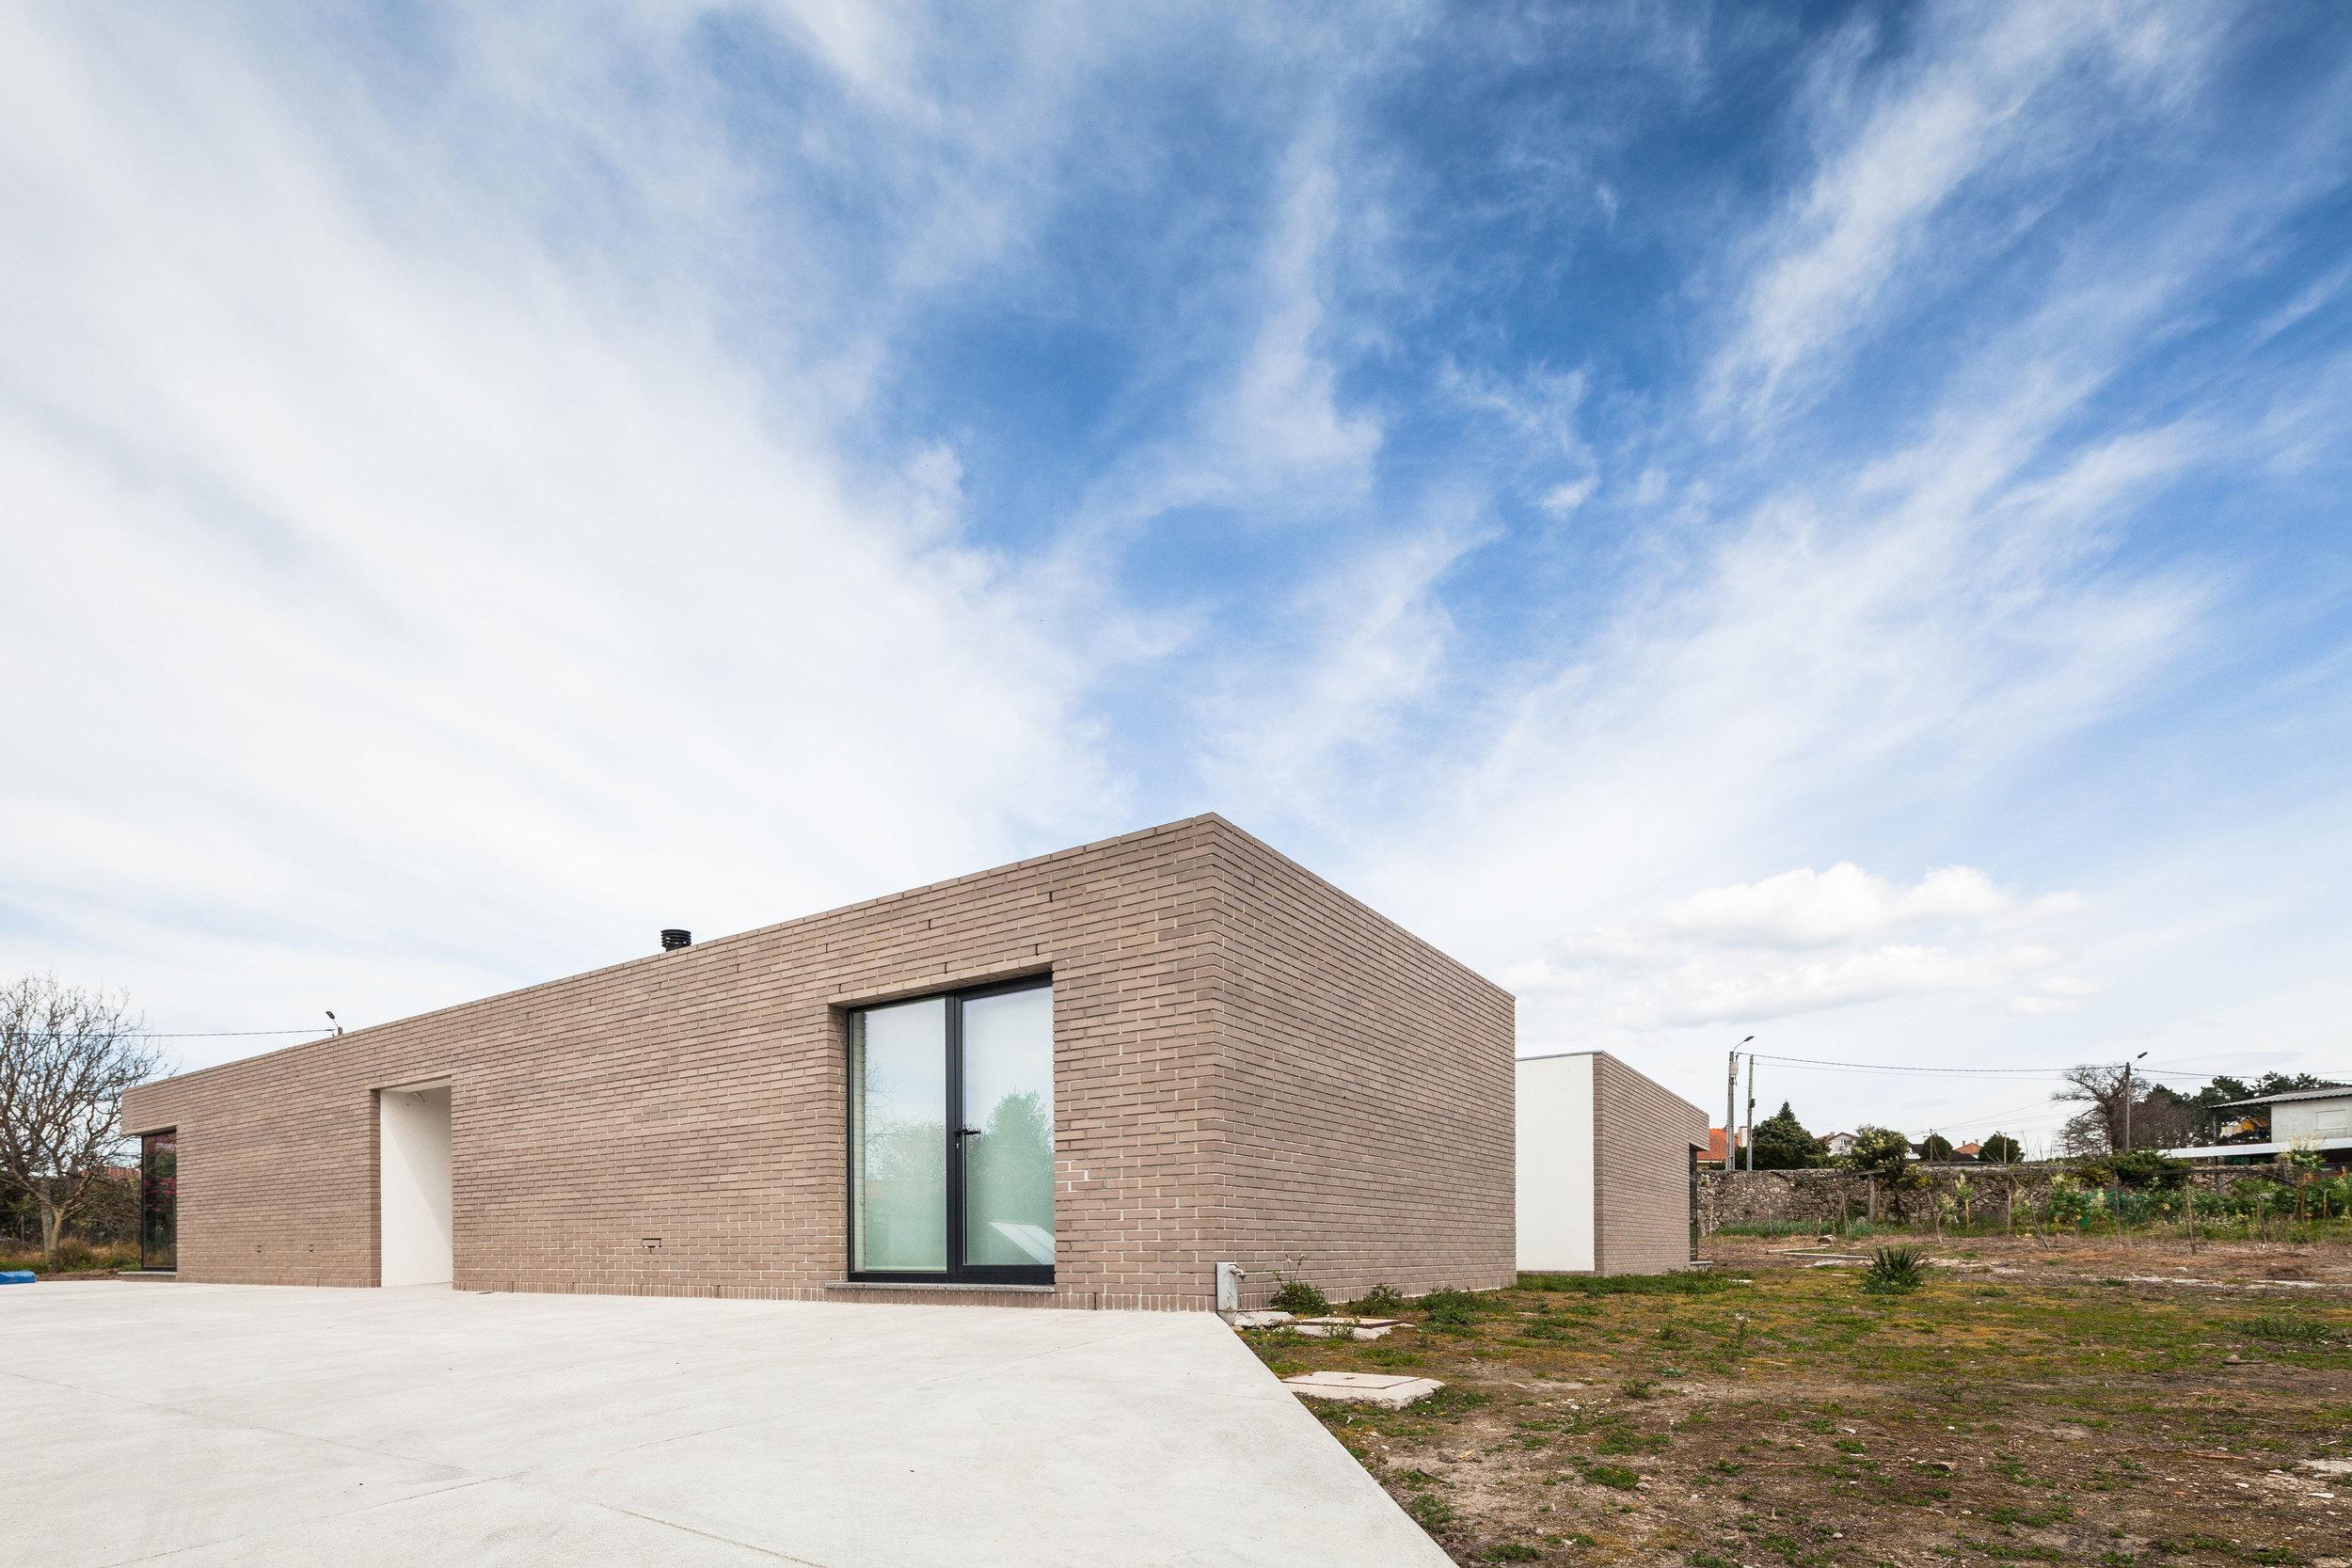 PROD_Open_patio_house_west_view.jpg